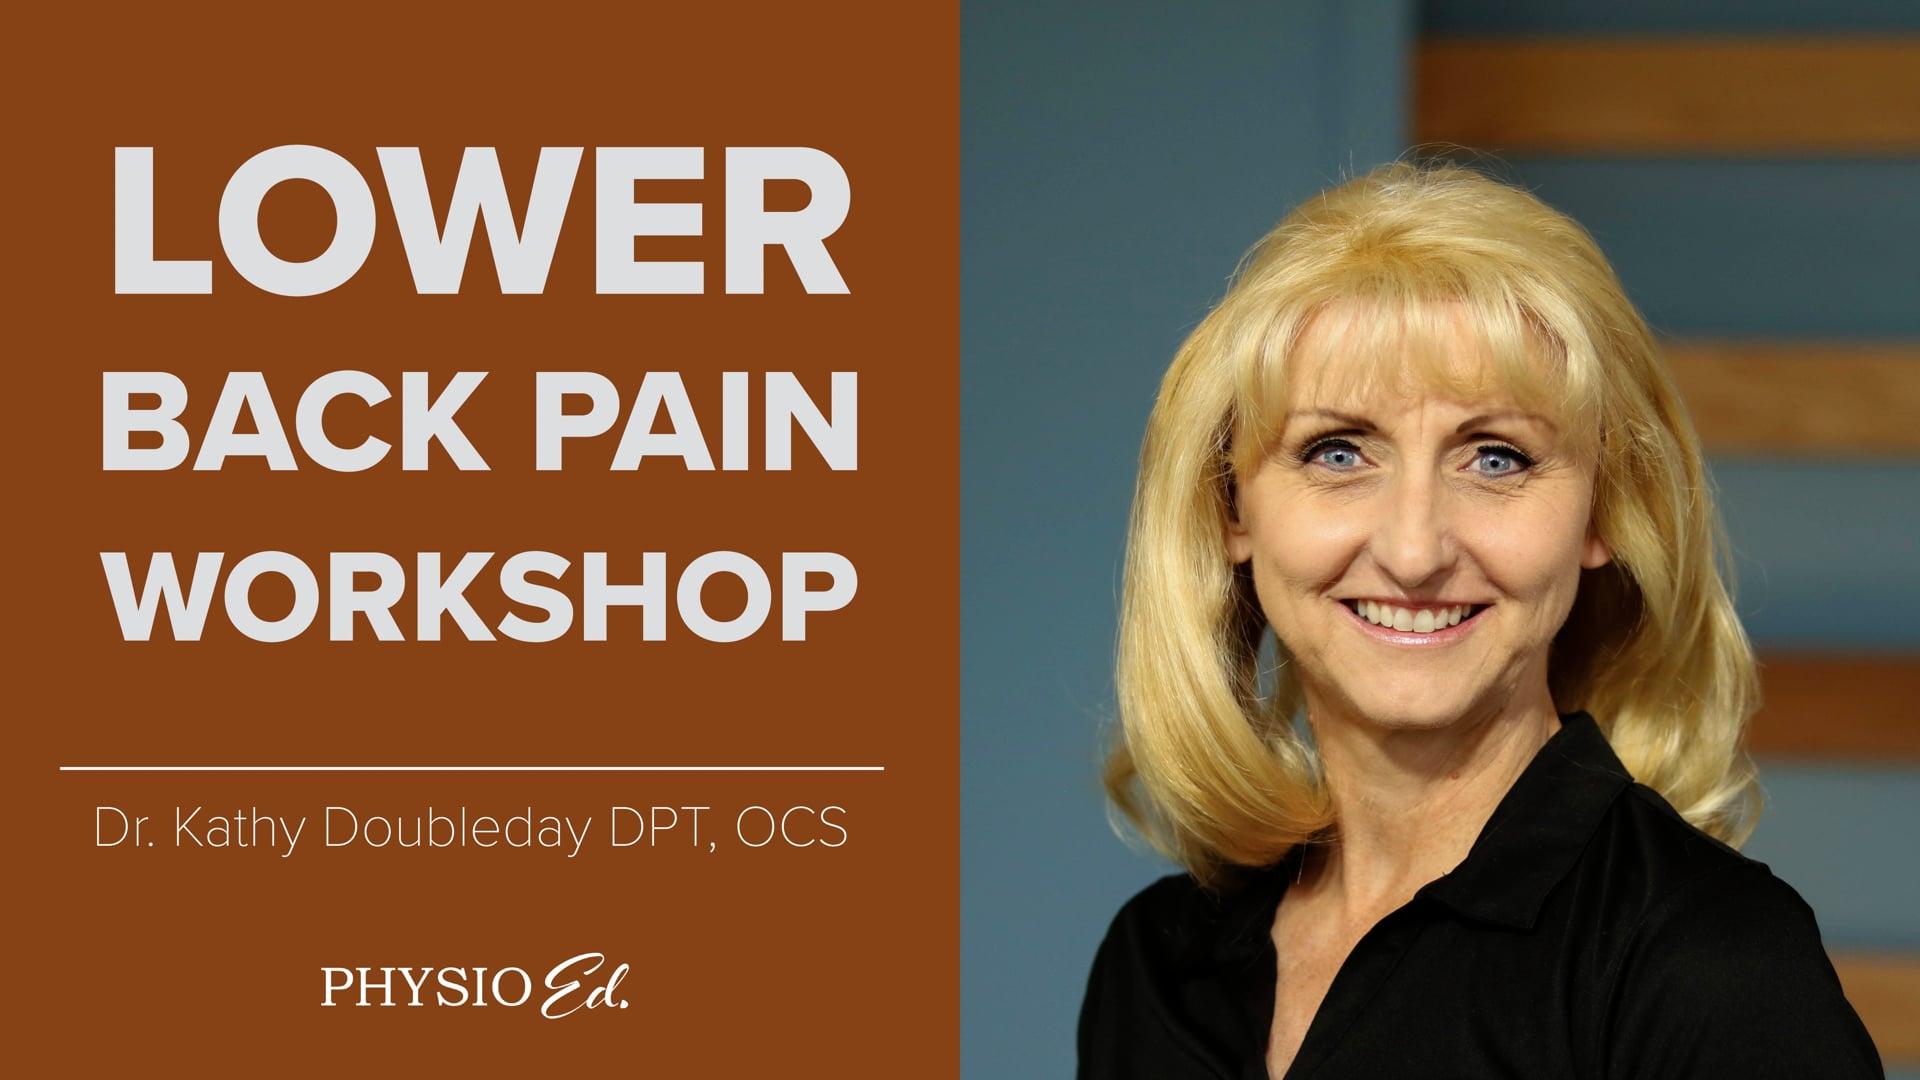 Lower Back Pain Workshop